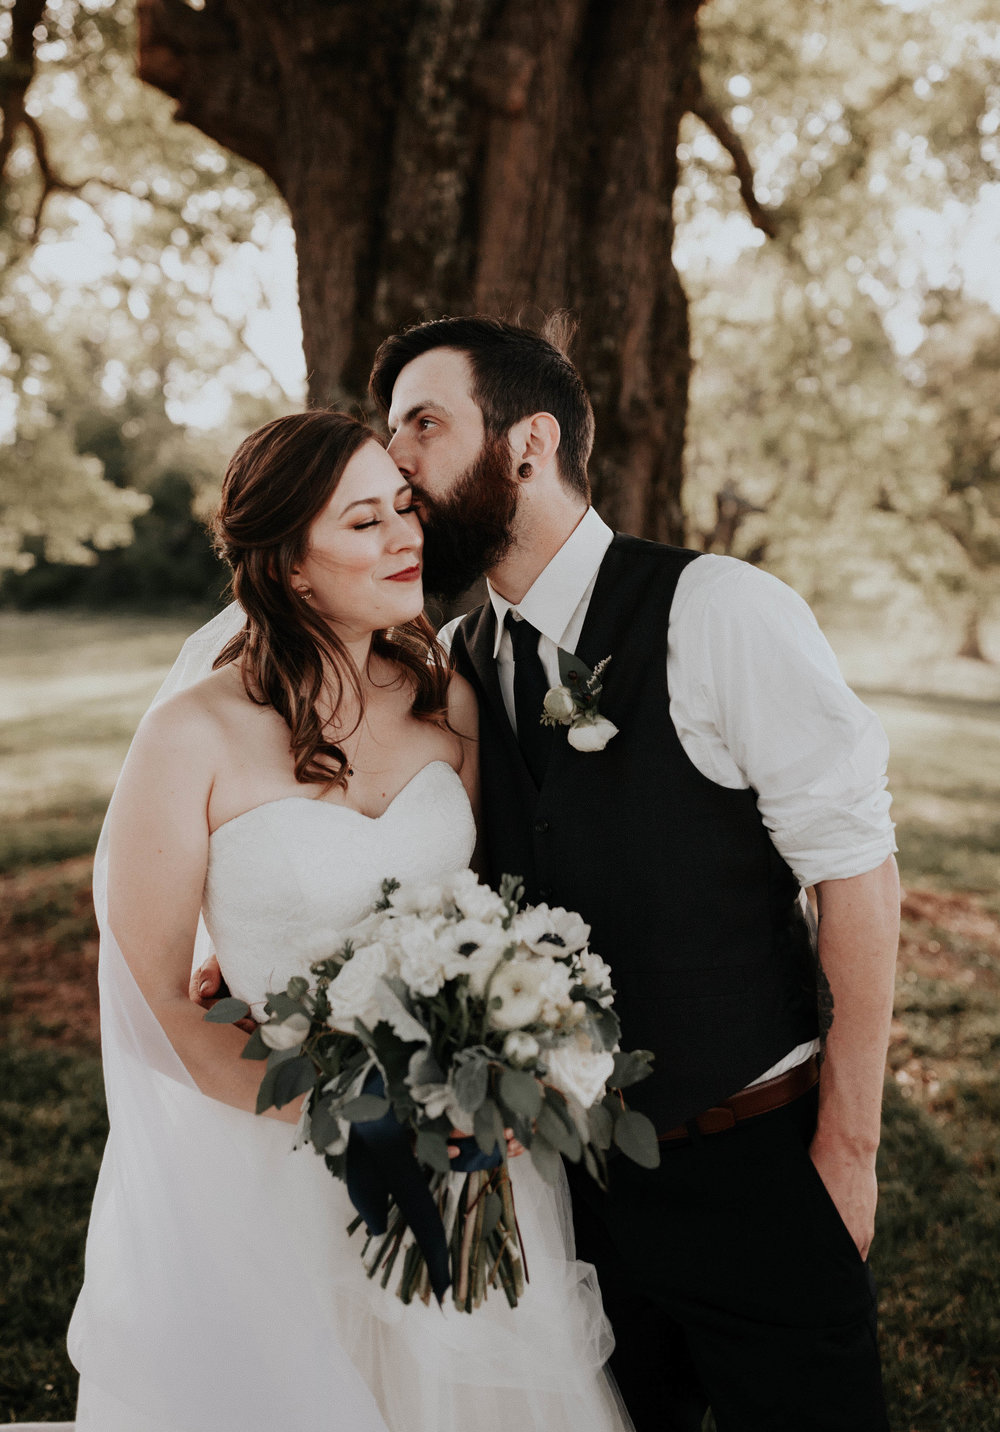 Adam_and_Hannah_Wedding_CharisLauren__5596.jpg